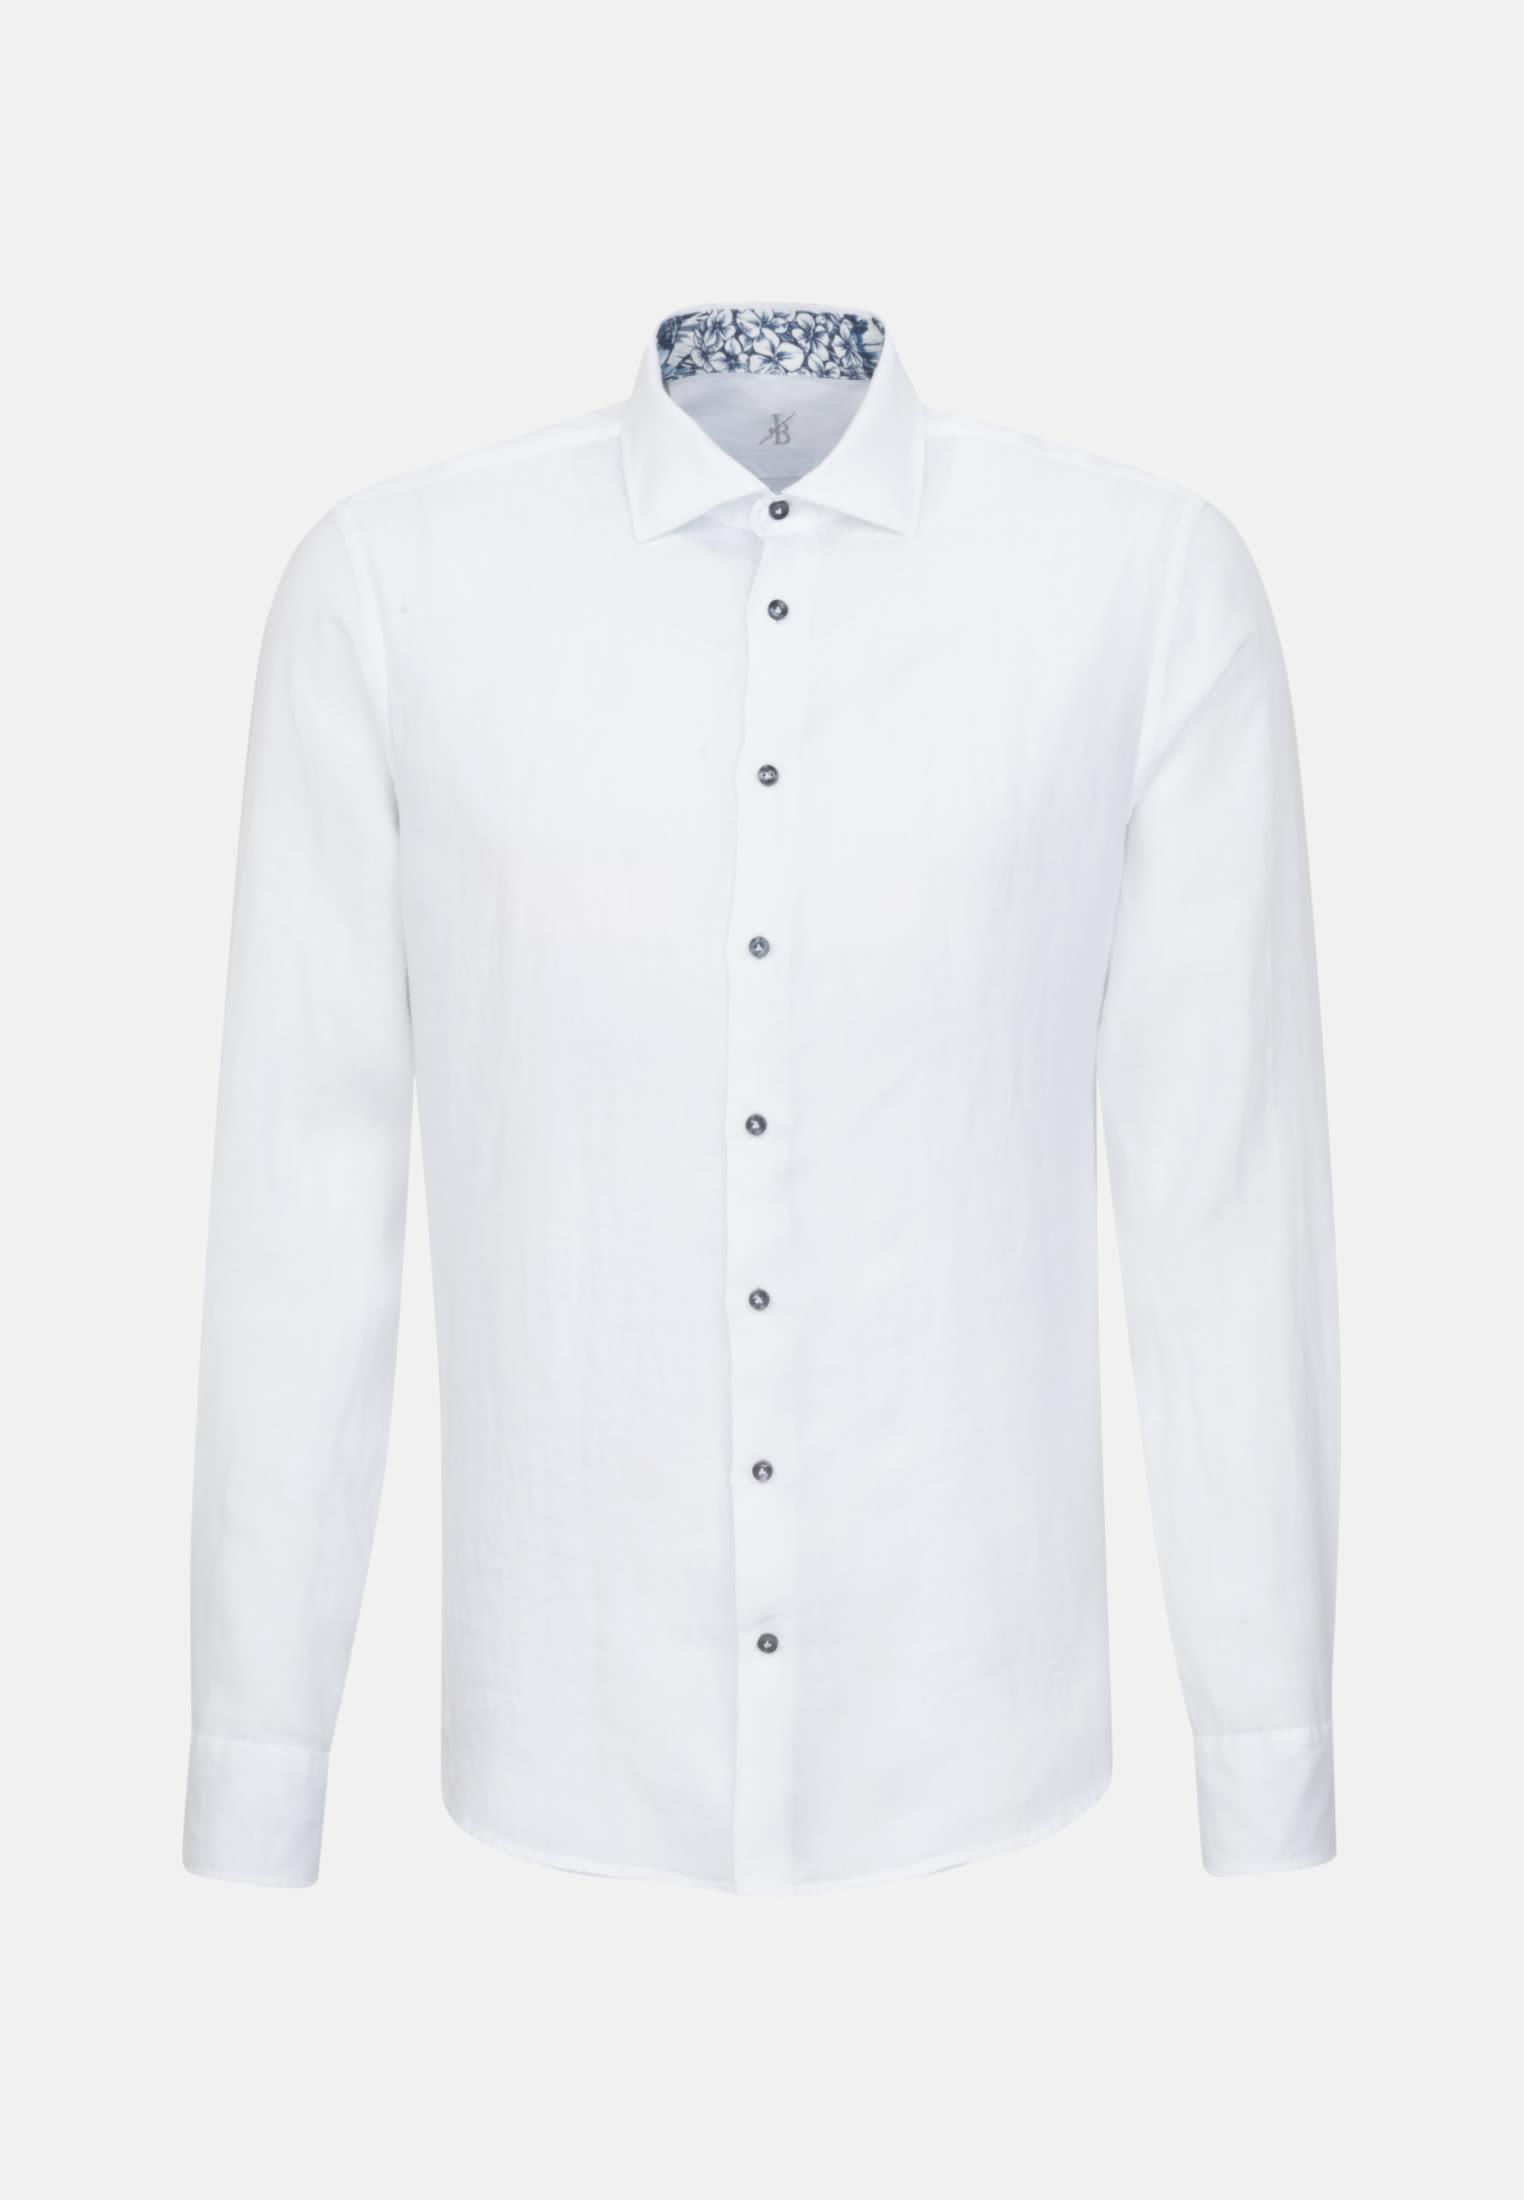 Leinen Smart Casual Hemd in Perfect Fit mit Kentkragen in Weiß |  Jacques Britt Onlineshop